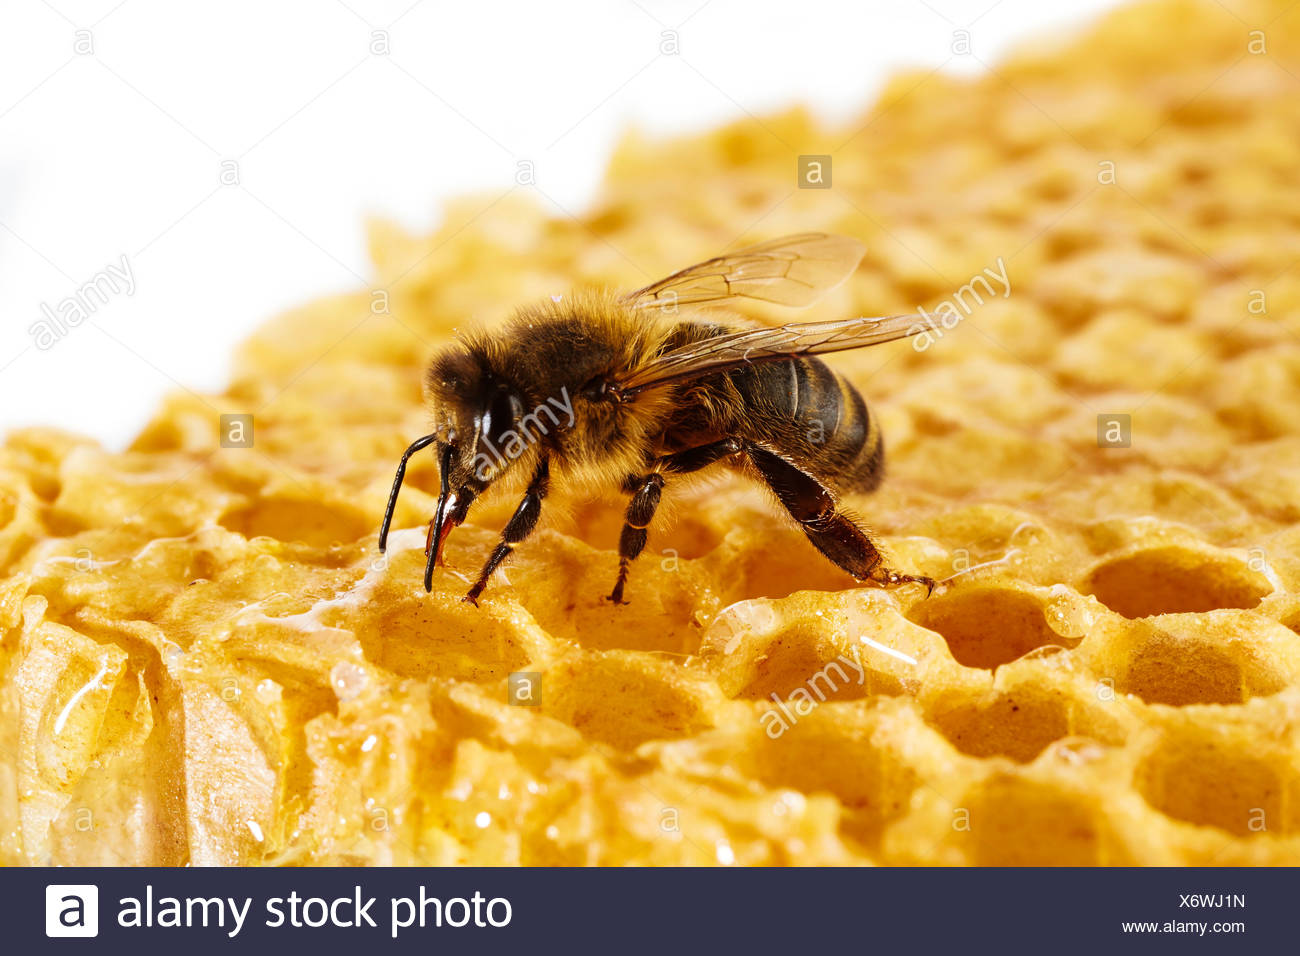 Honey bee on honeycomb - Stock Image